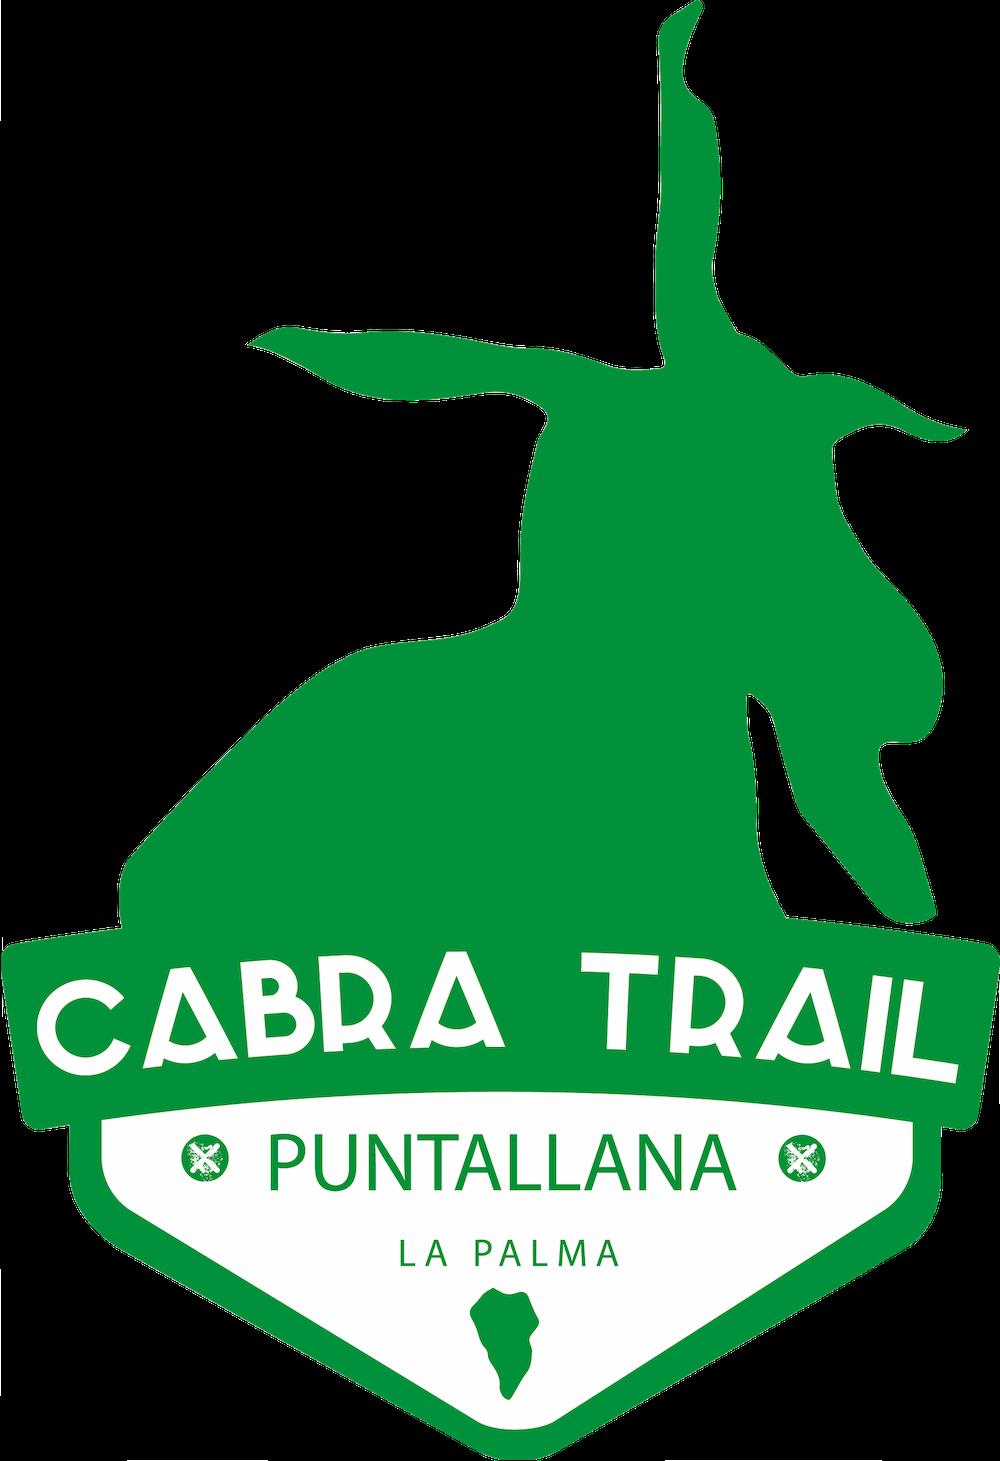 Puntallana Cabra Trail Logo